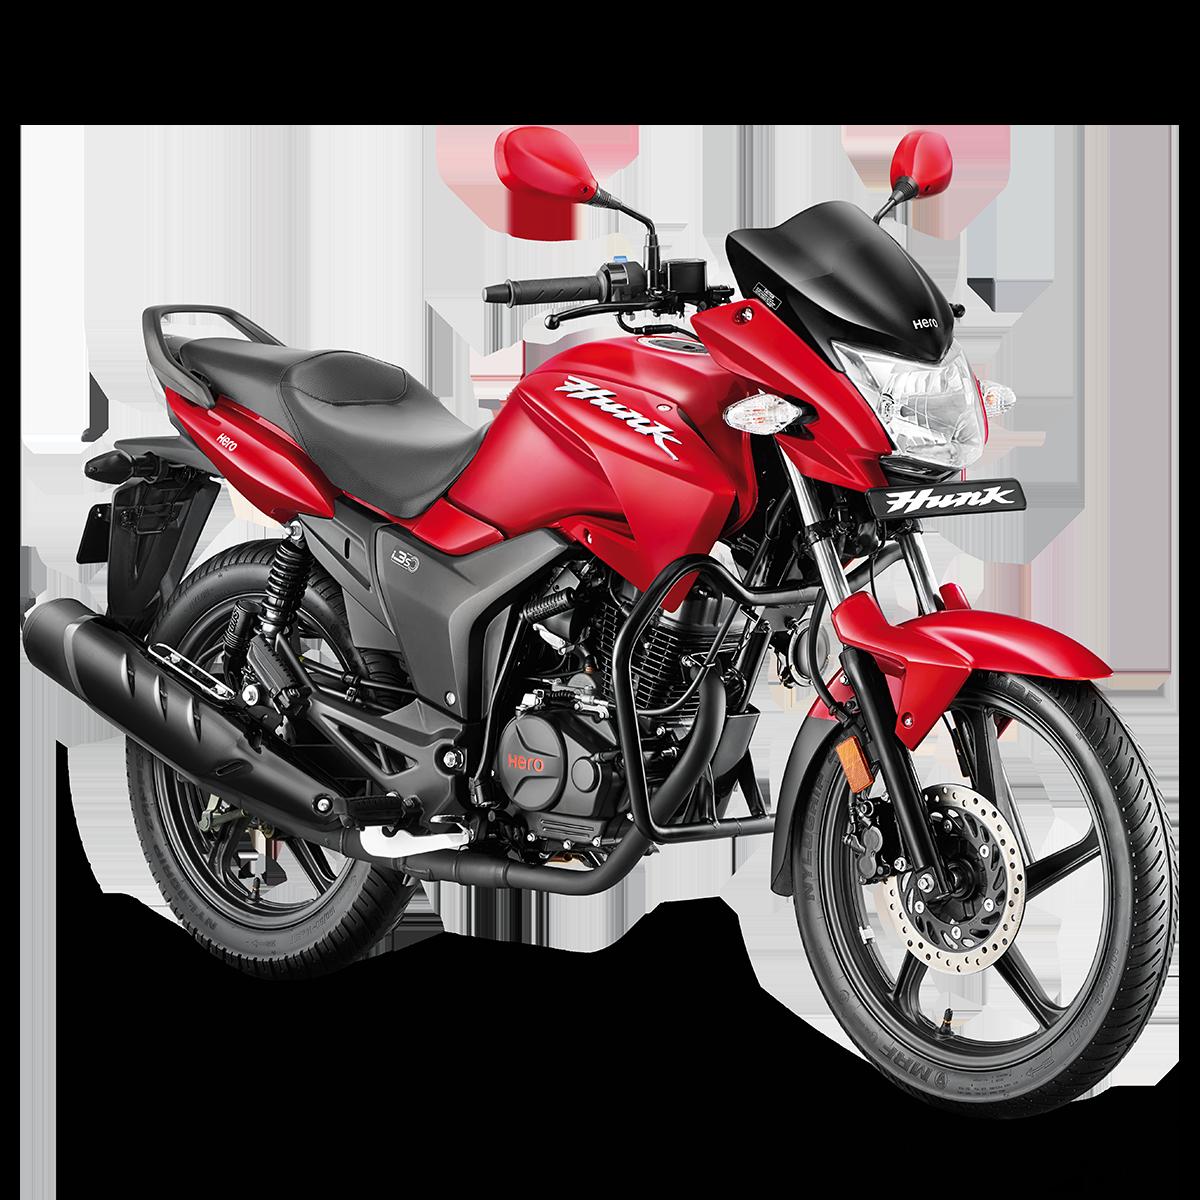 HUNK i3S - Motor: 150cc / Potencia: 15.8 bhpPrecio: $1,999.00